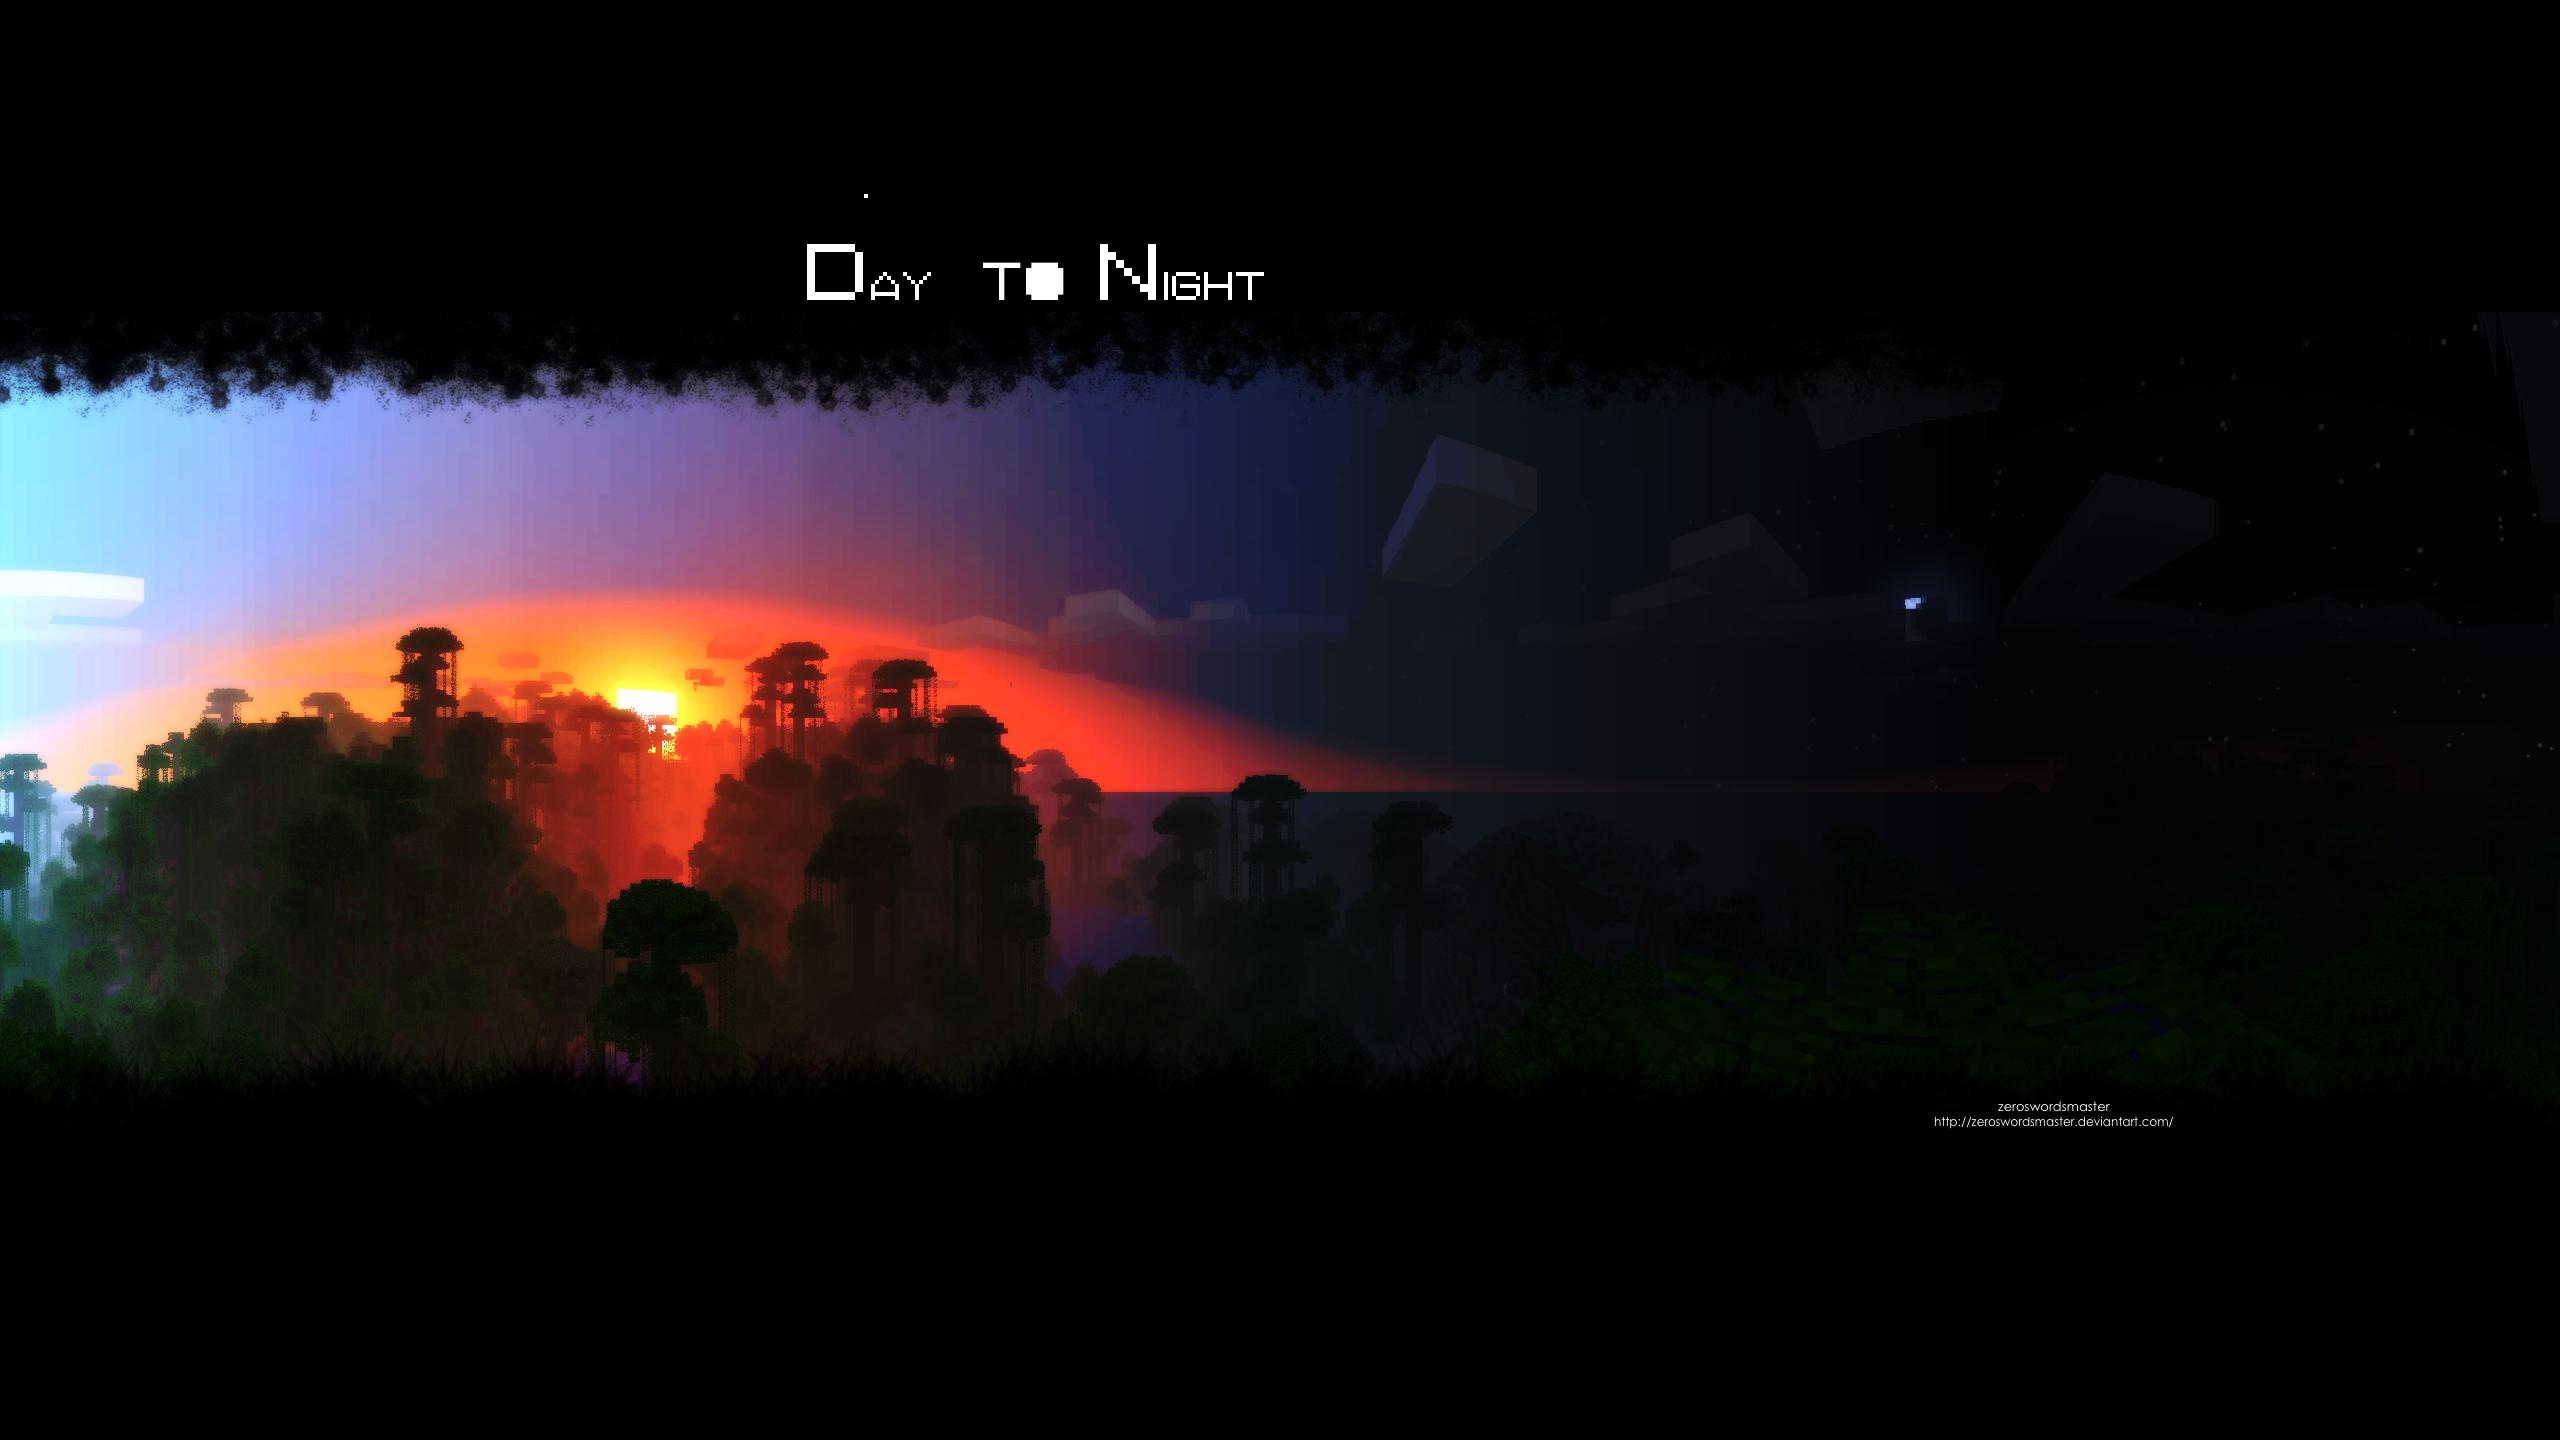 Popular Wallpaper Minecraft Night - day_to_night__minecraft__by_zeroswordsmaster-d4sfd3x  Gallery_833538.png